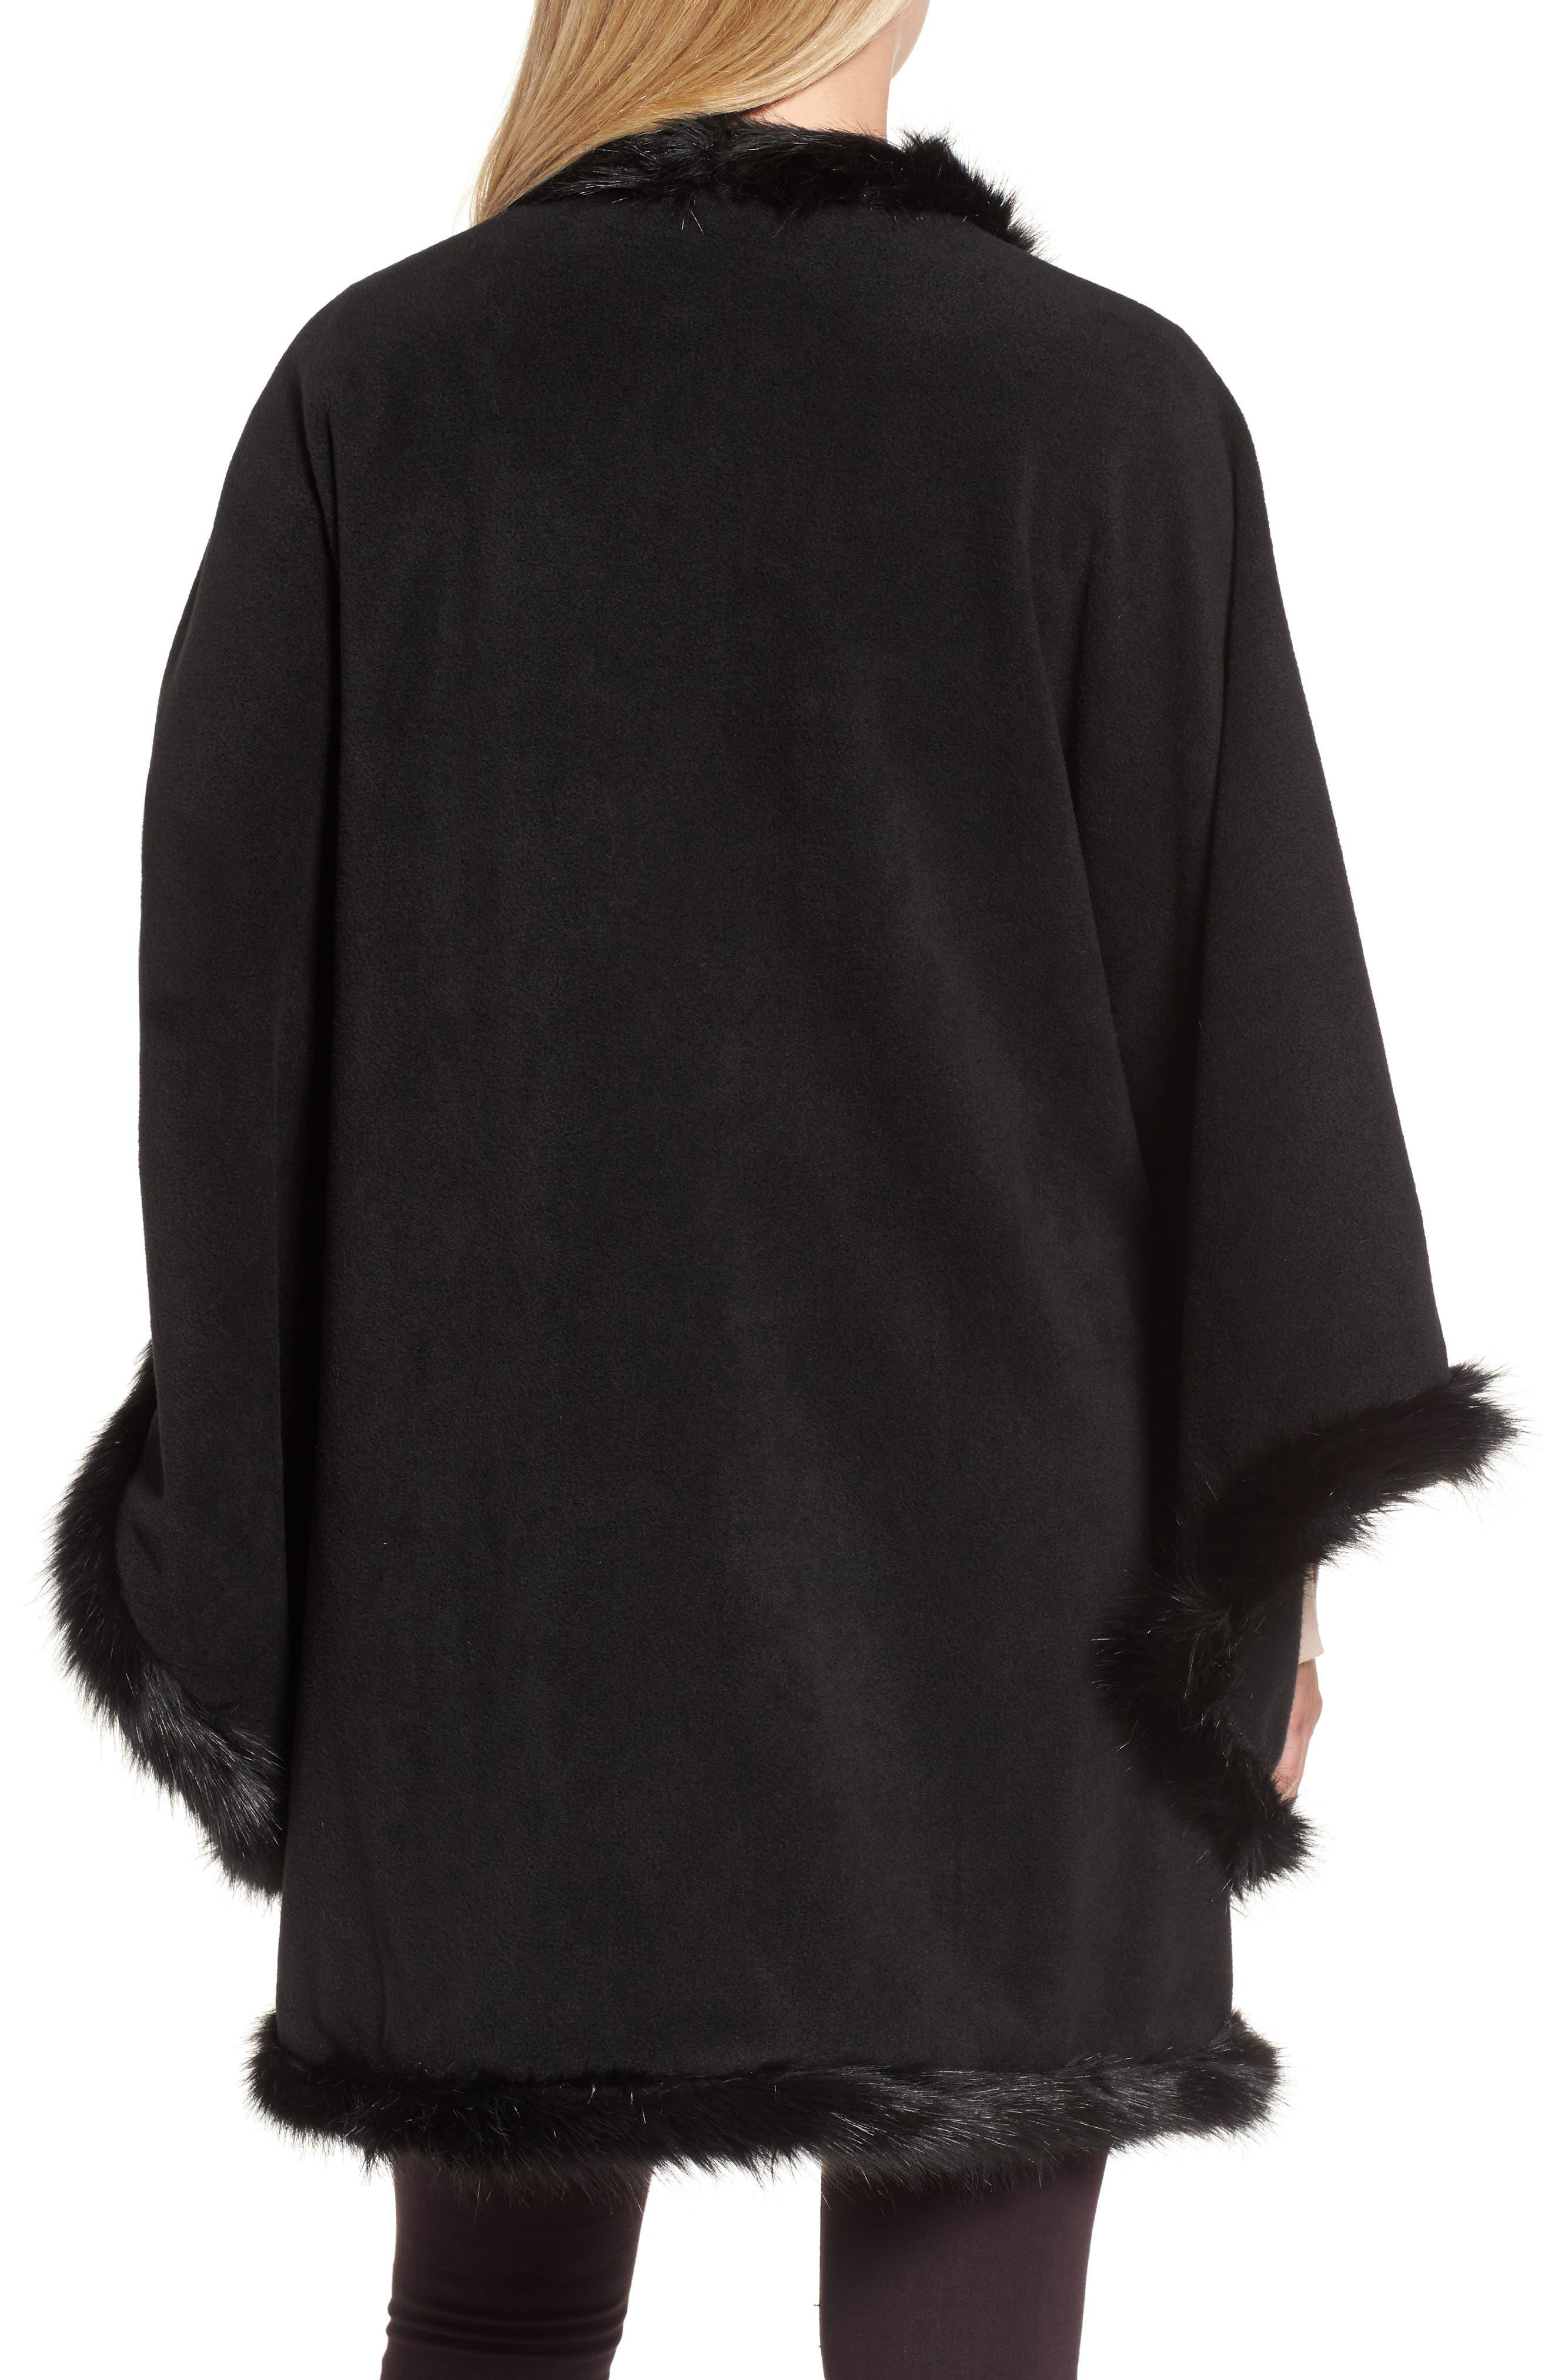 Tara Faux Fur Trim Wrap,                             Alternate thumbnail 2, color,                             001